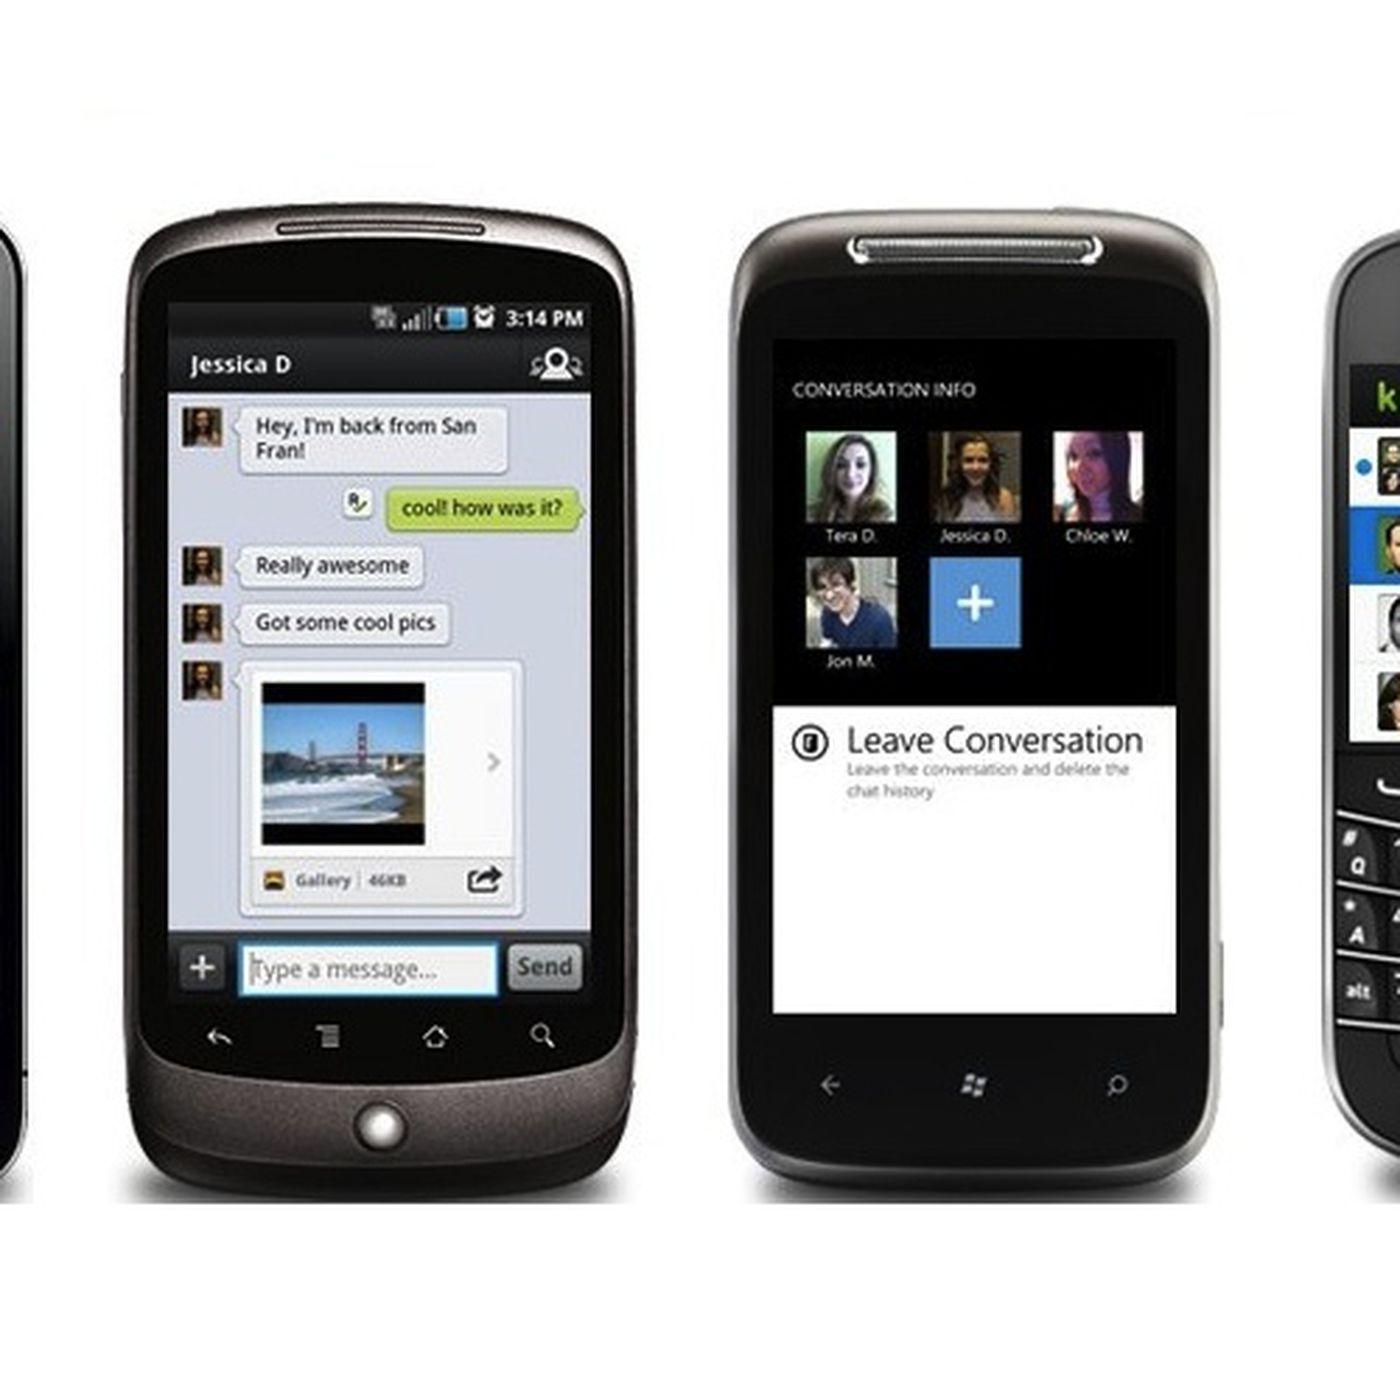 Kik Messenger returns to BlackBerry, but not through App